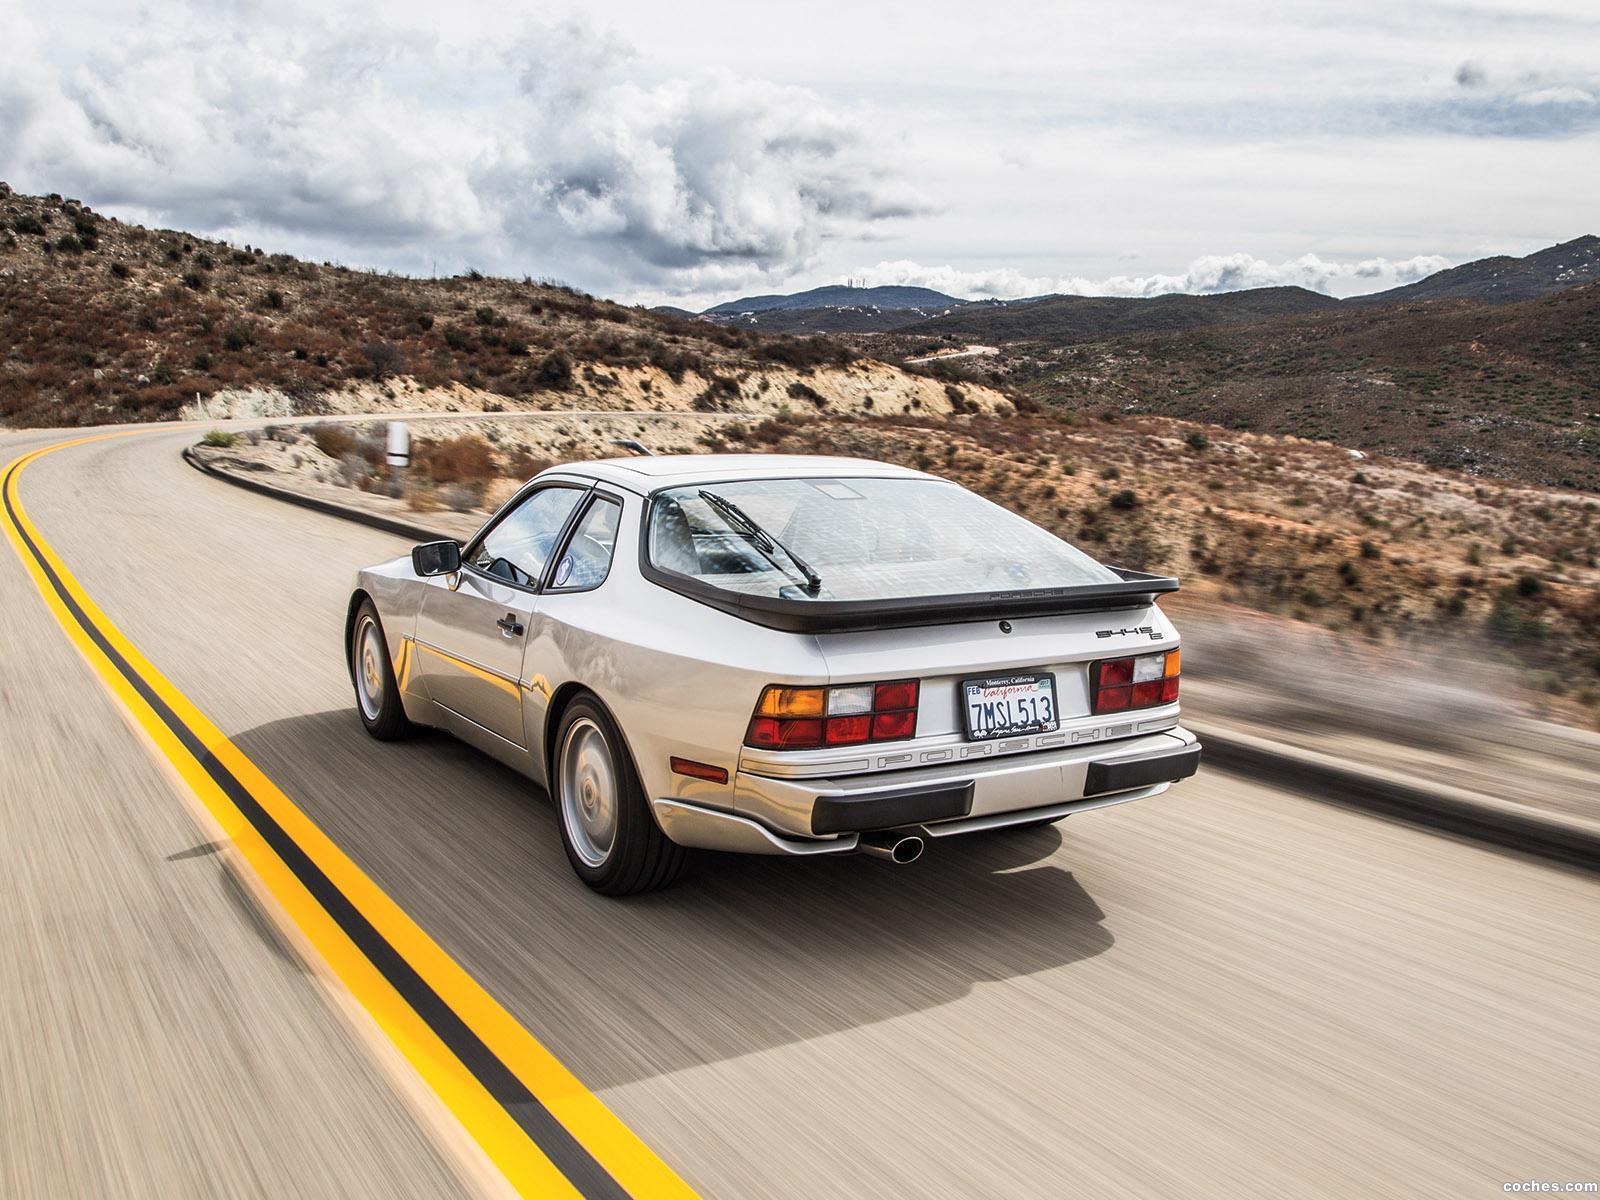 Foto 3 de Porsche 944 S2 USA 1989